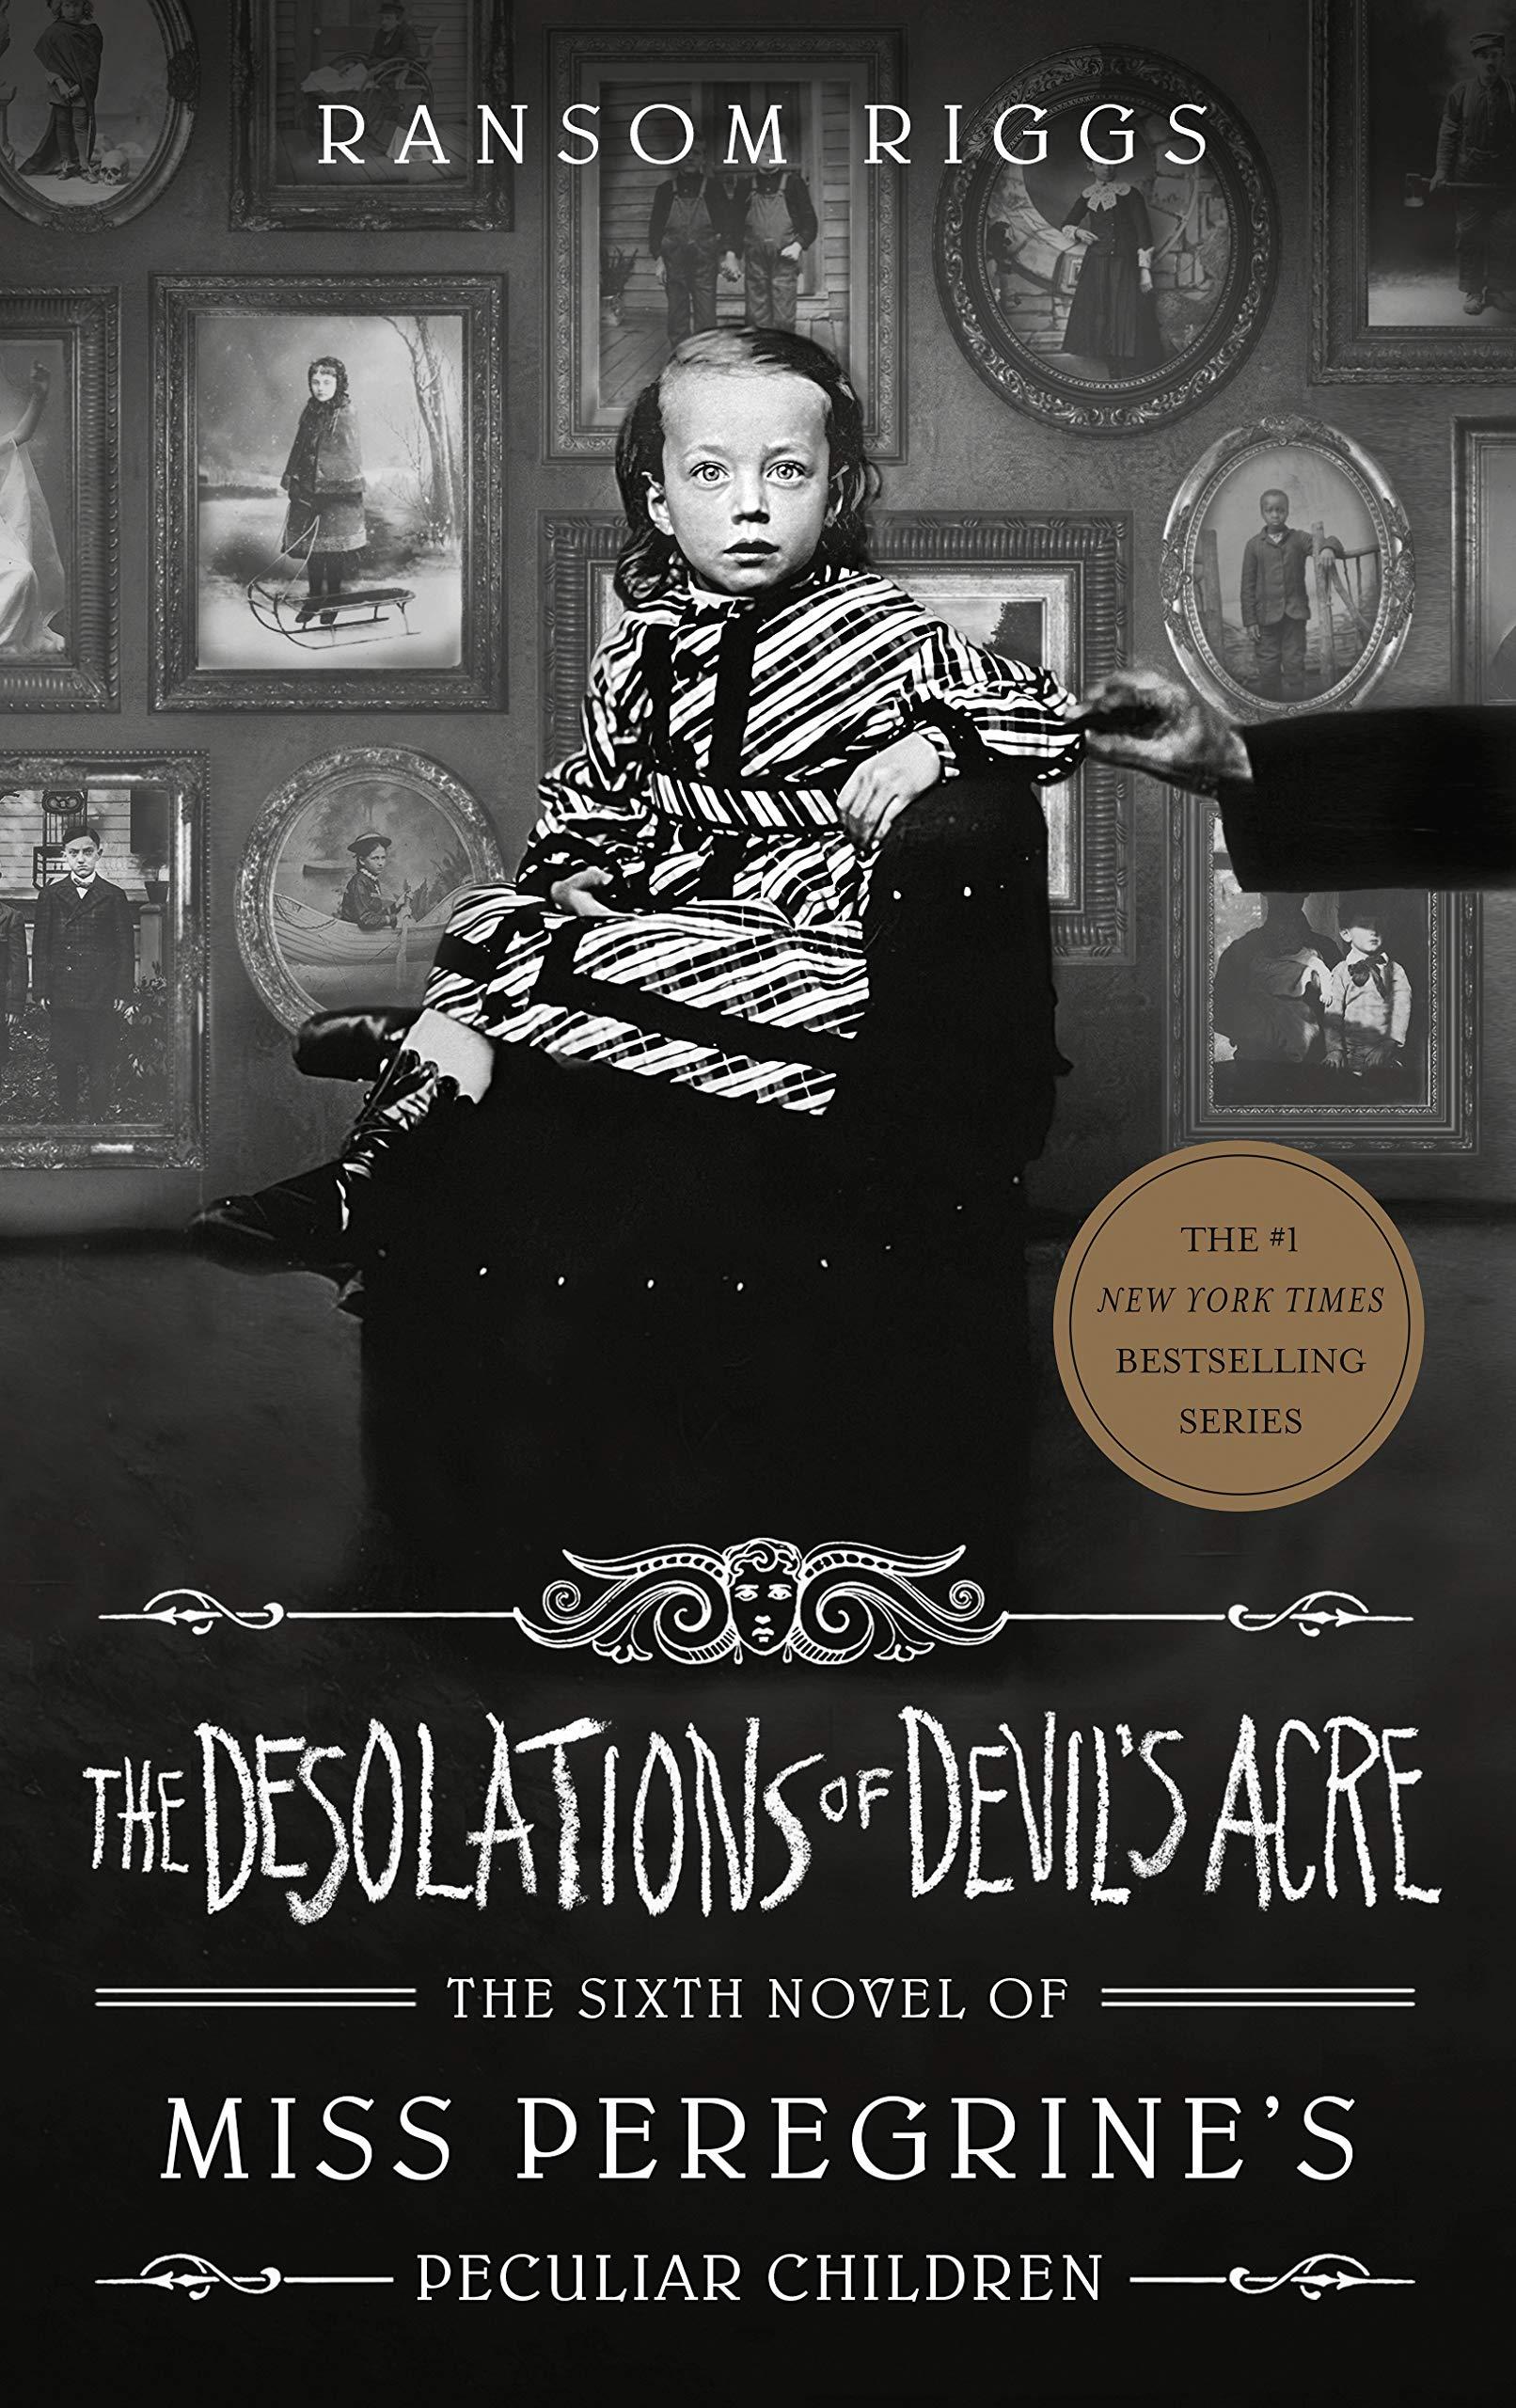 The Desolations of Devil's Acre